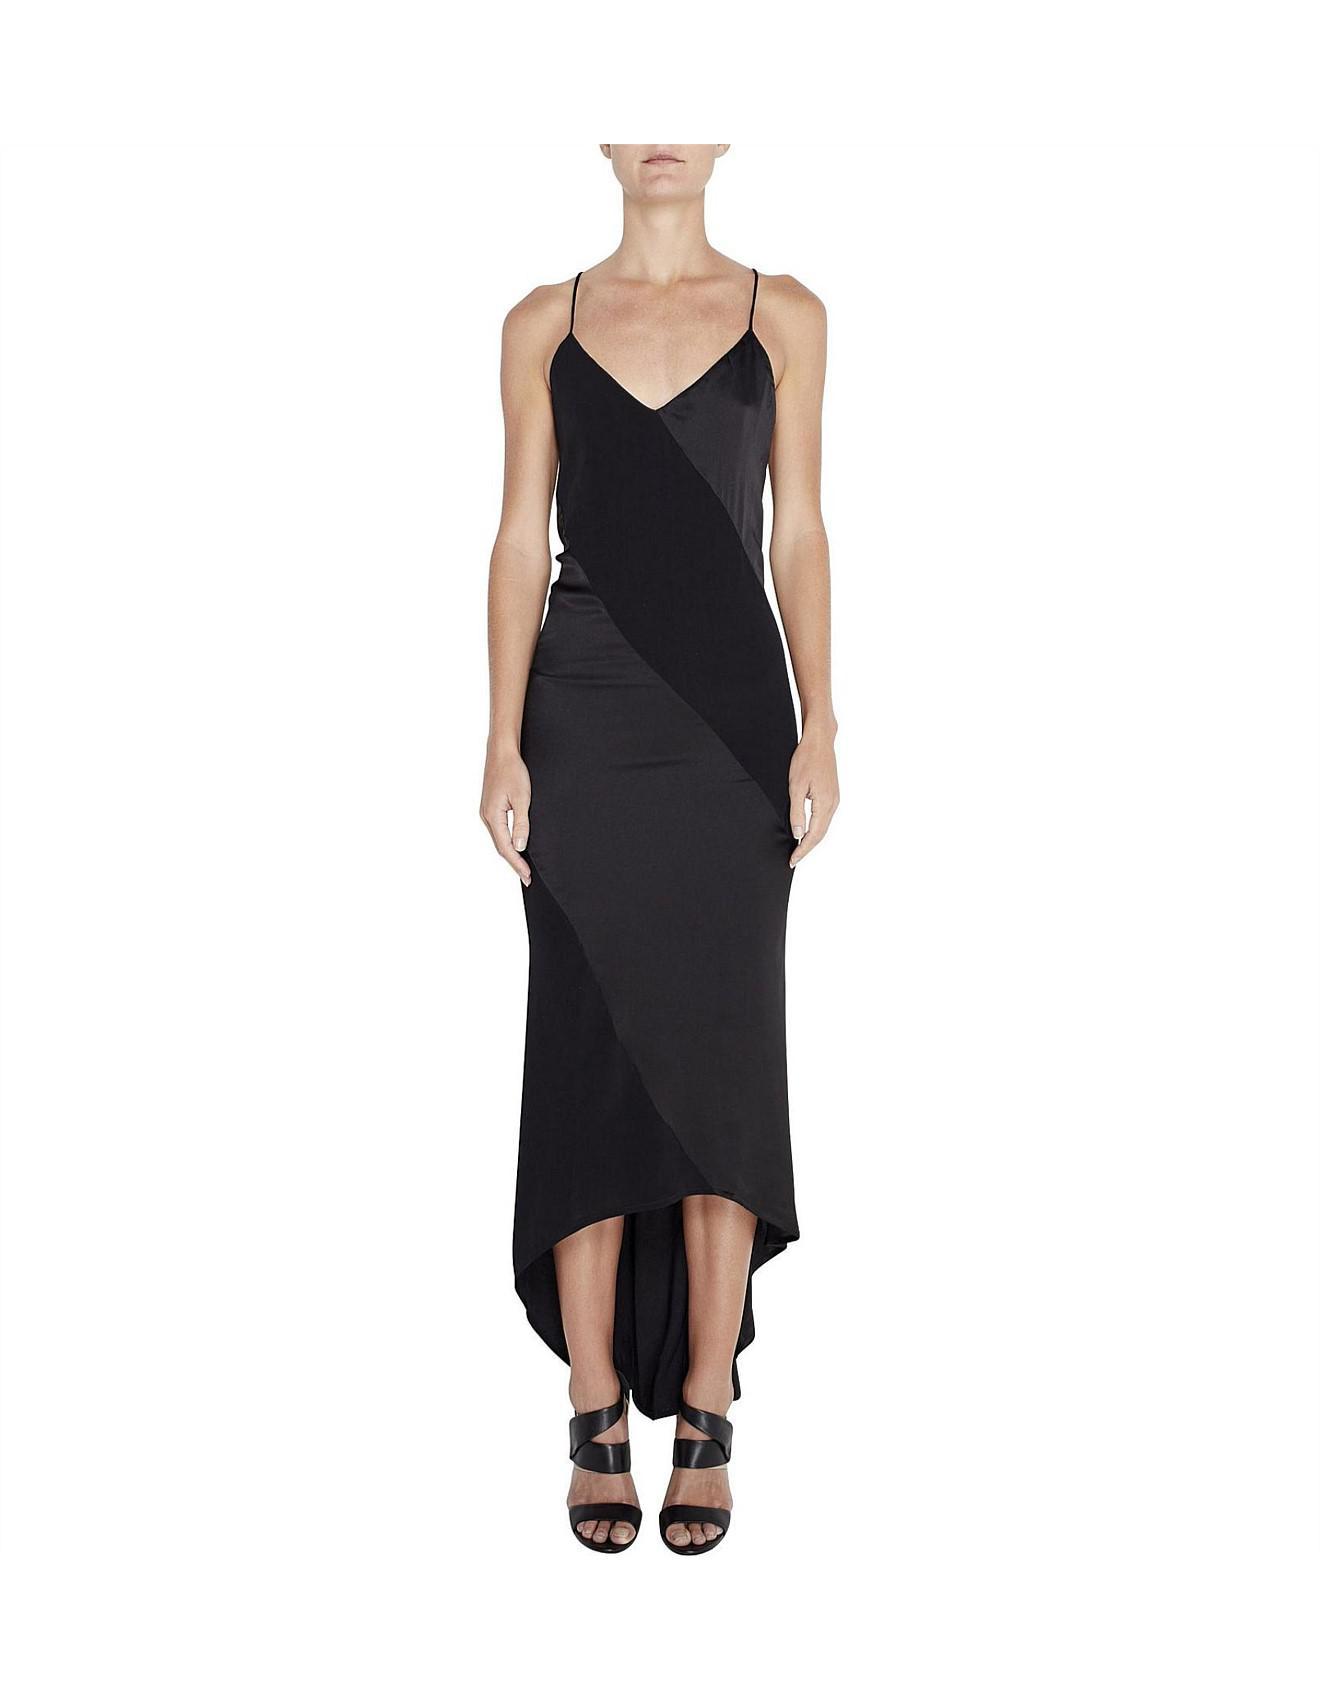 737989a3f2db8 MLM Label Lennox Slip Dress in Black - Lyst